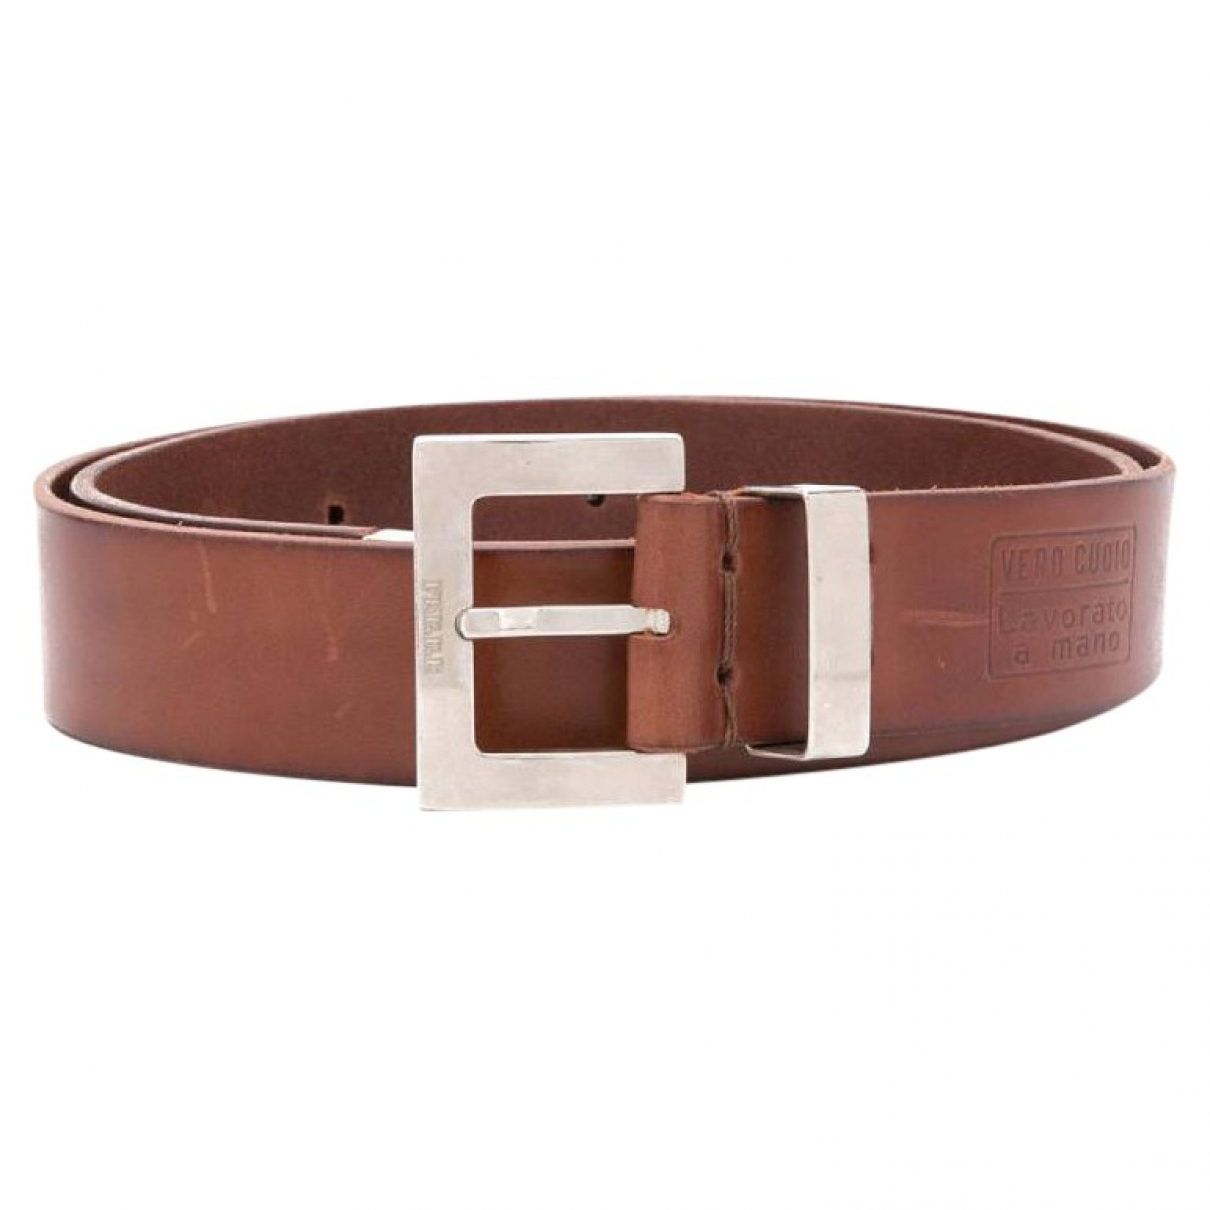 Gianfranco Ferré \N Brown Leather belt for Men 90 cm